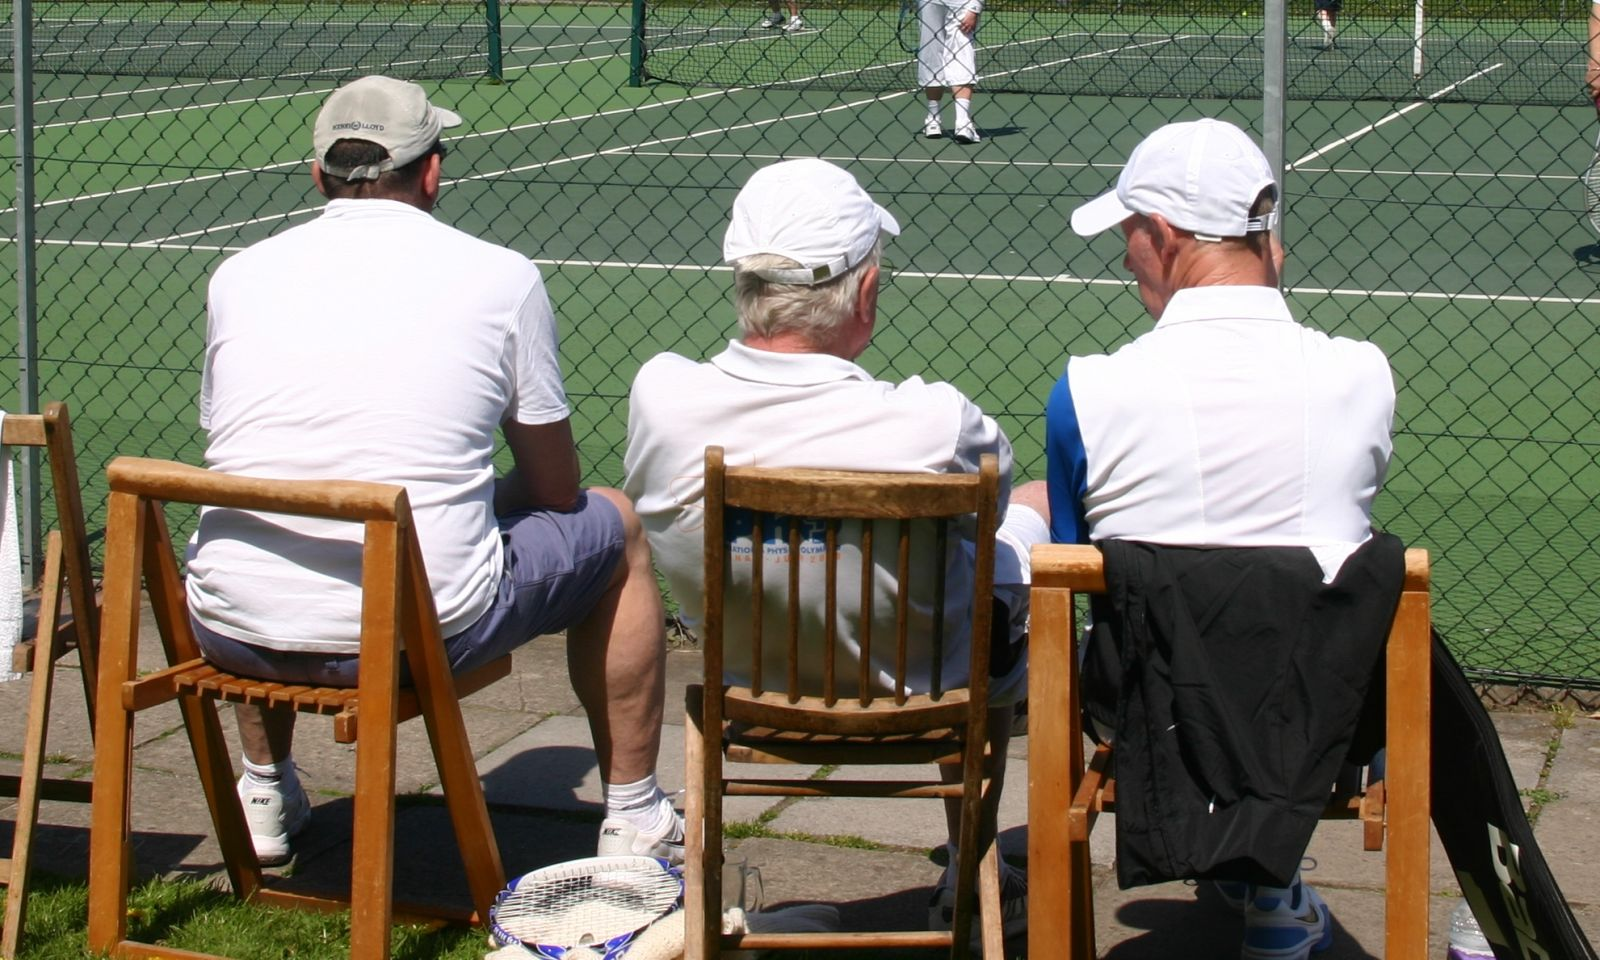 Spectators - May 2013